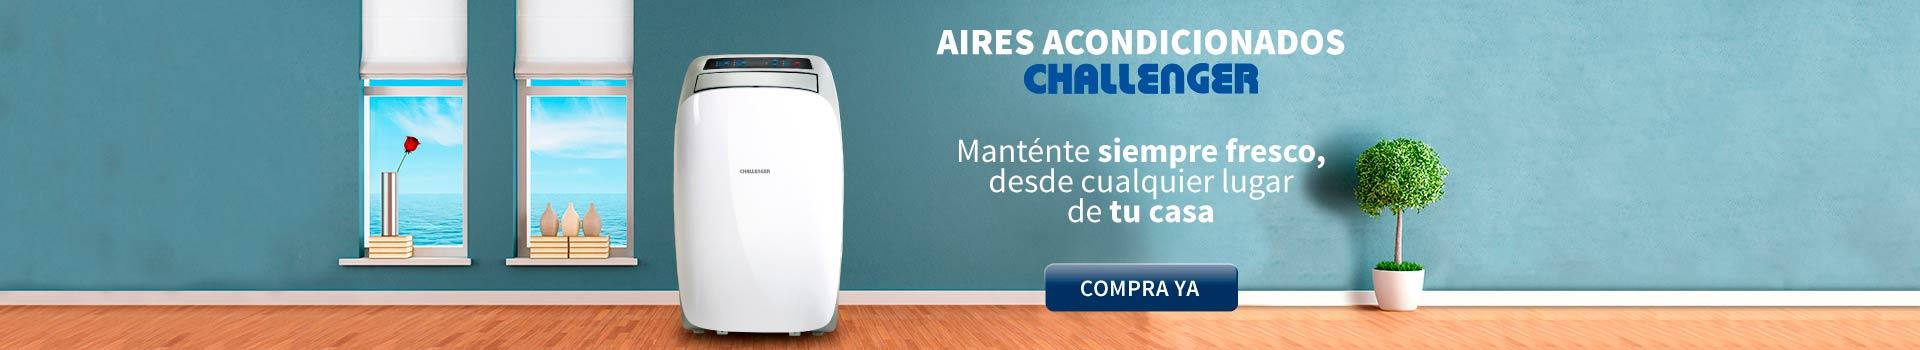 CAT ELECT - feb 21 - CHALLENGER Aires Acondicionados